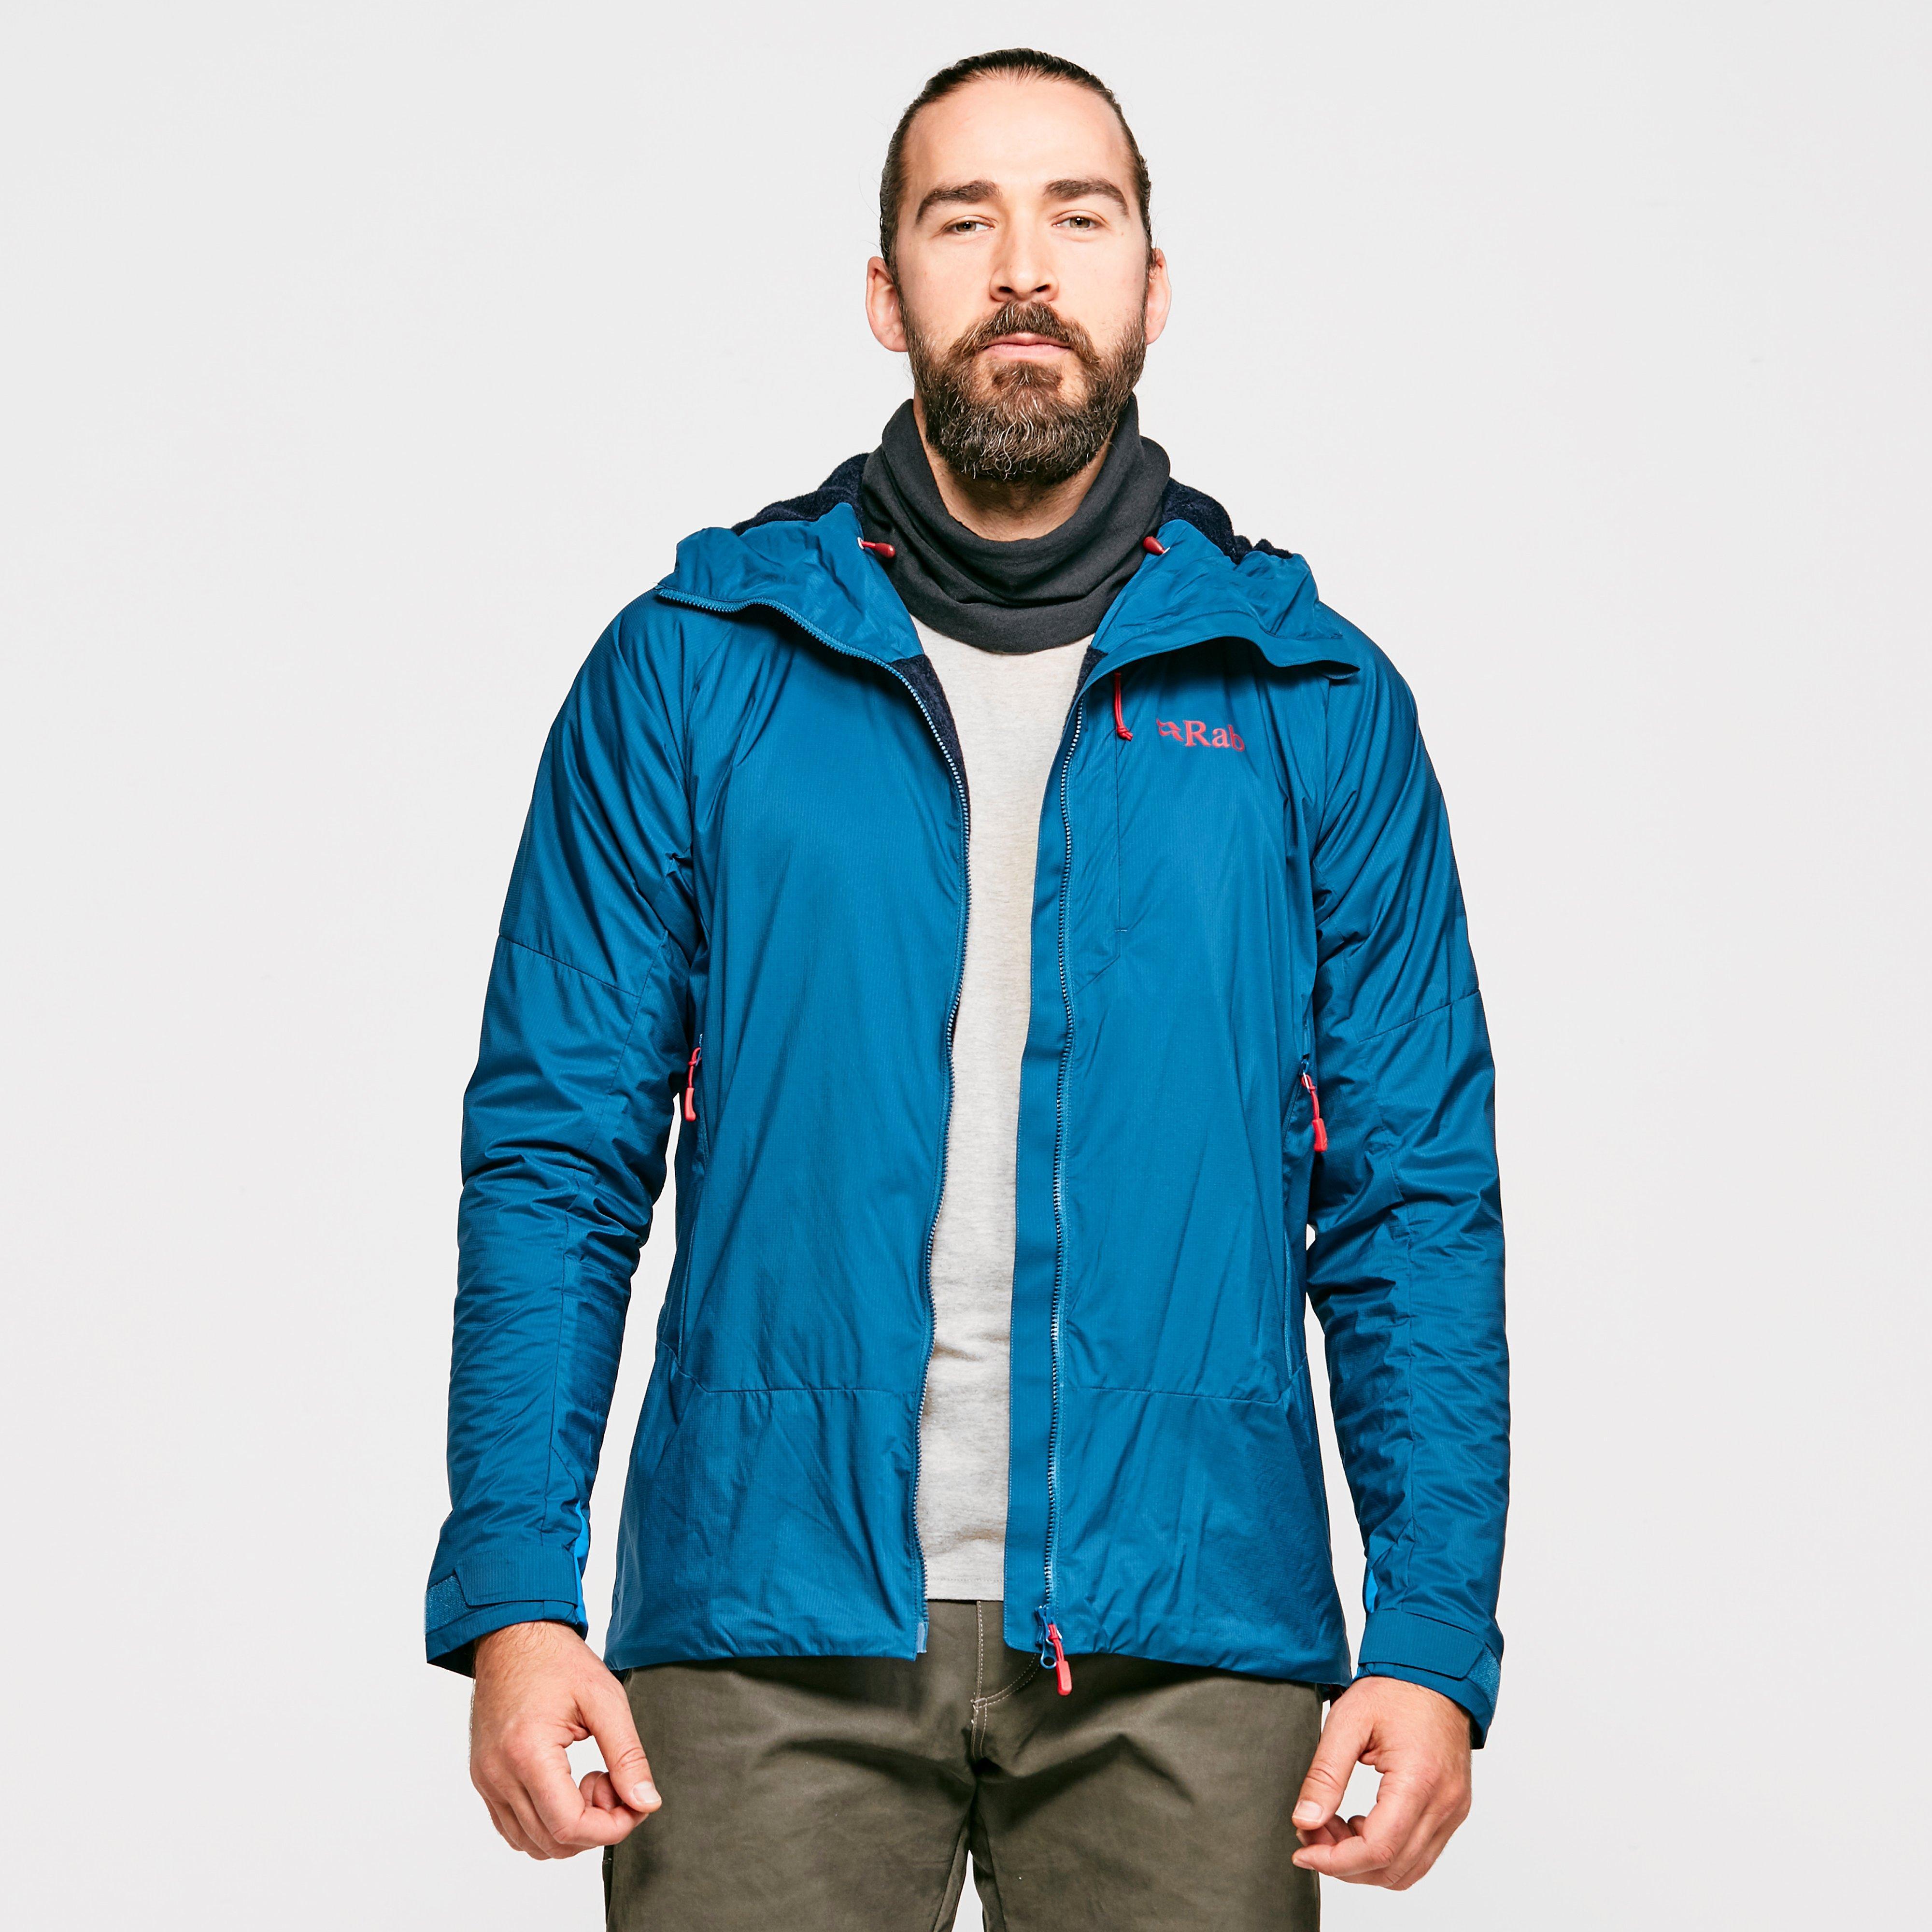 Rab Men's VR Summit Jacket, Blue/Blue